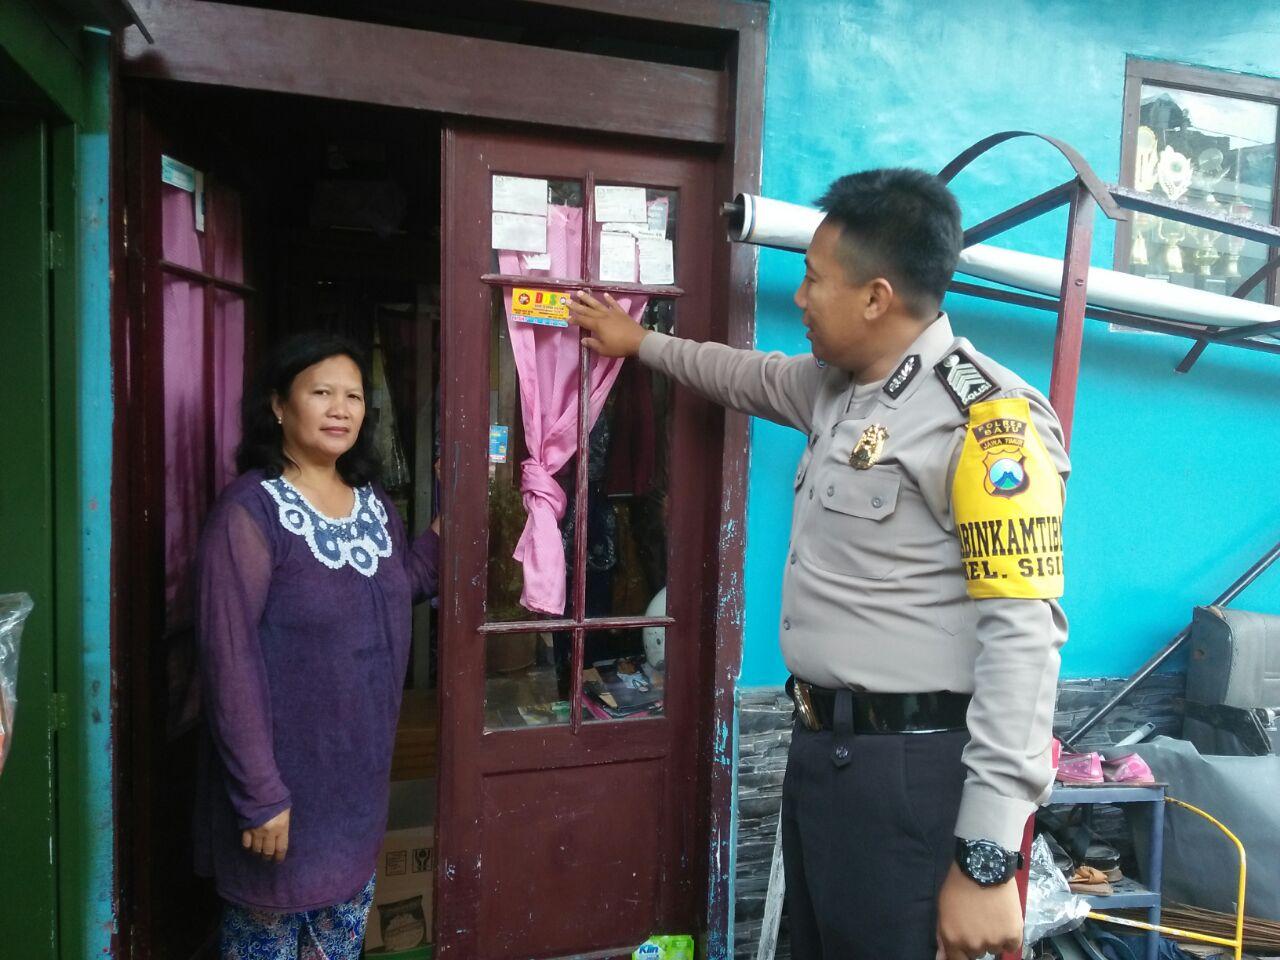 Melalui Kunjungan Mitra kepada Ibu Rumah Tangga Polsek Batu Kota Polres Batu Tingkatkan Kepercayaan